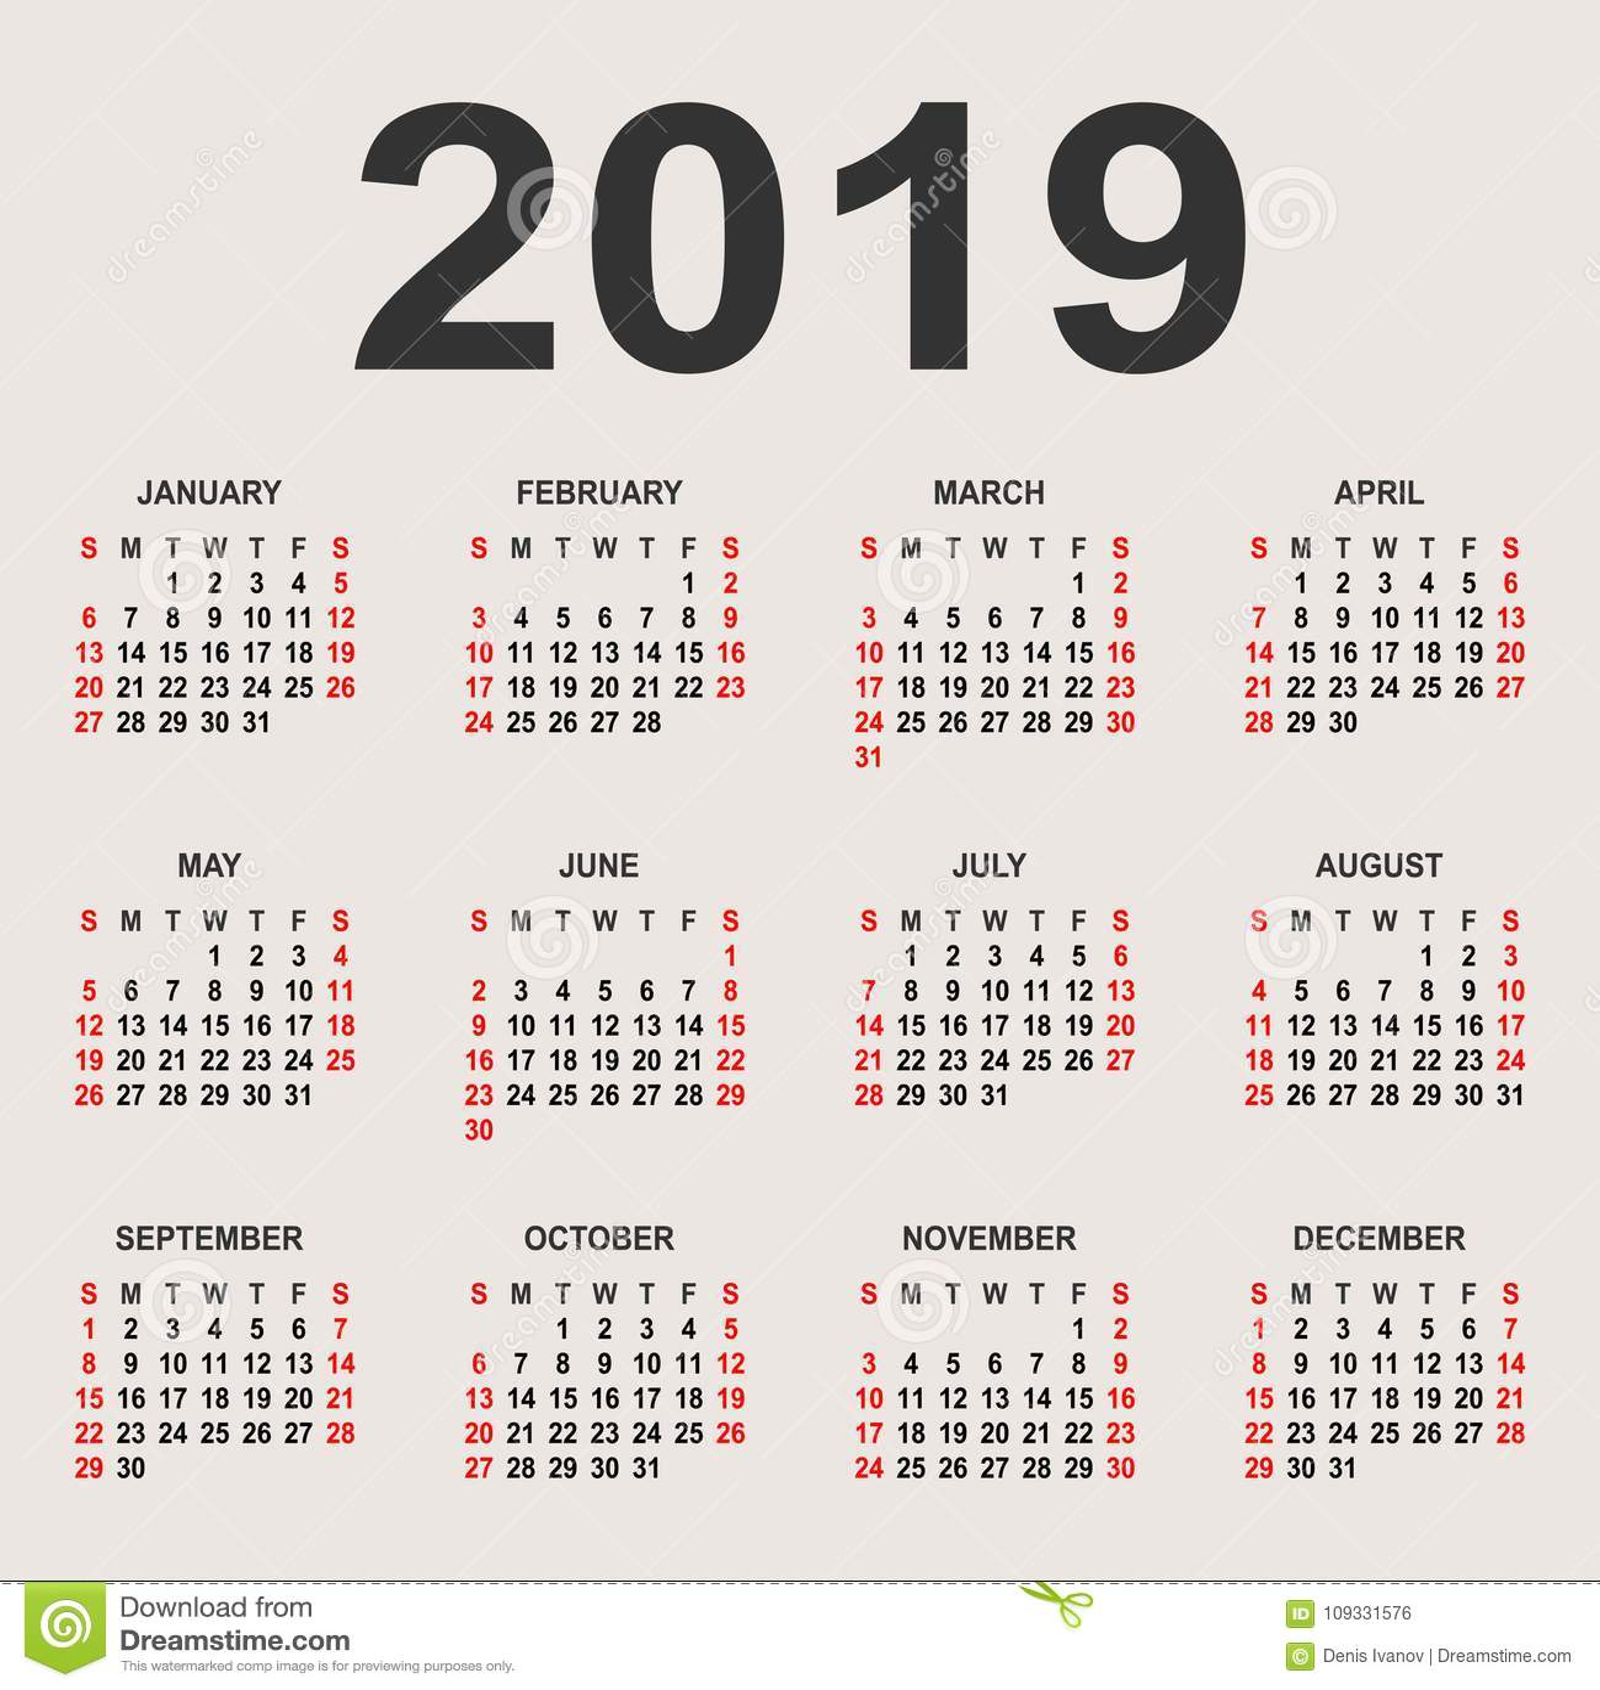 2019 Calendar Year Template